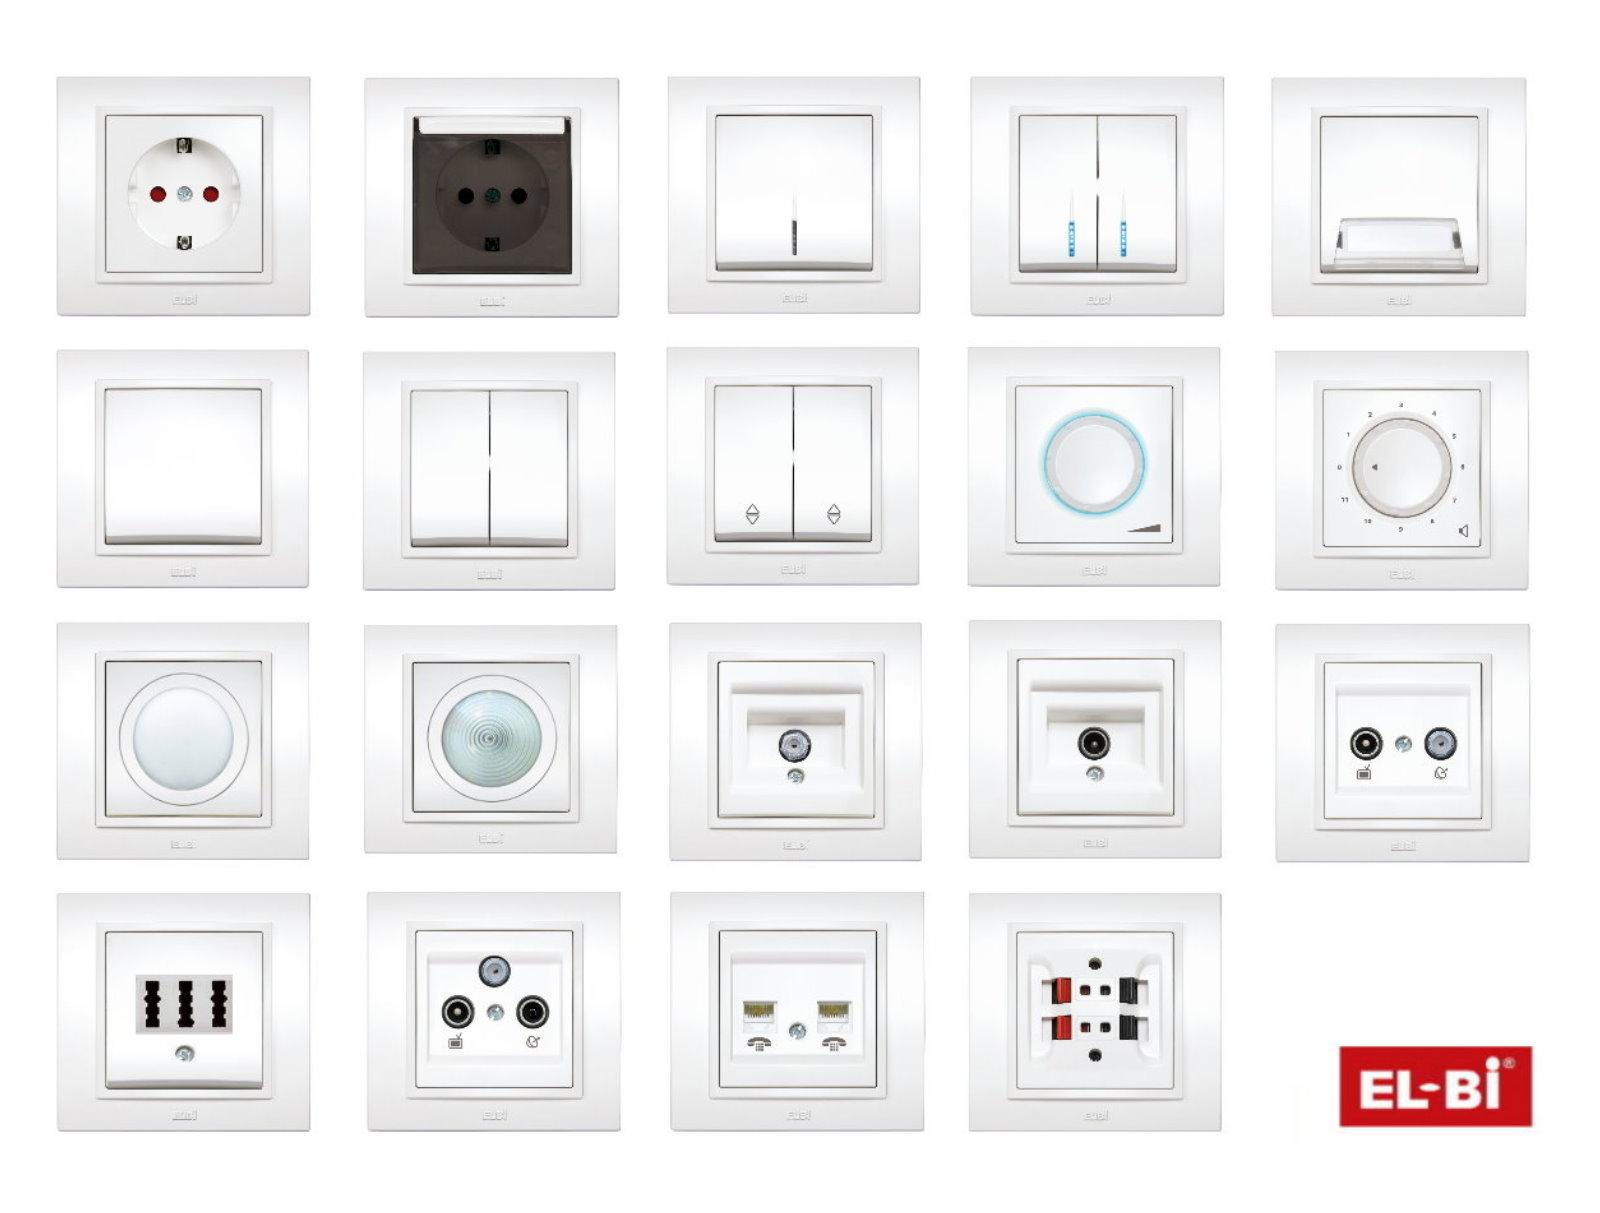 7 98 m 5 x aluminium kabelkanal 150cm schwarz rund alu kabel kanal lcd tv ebay. Black Bedroom Furniture Sets. Home Design Ideas